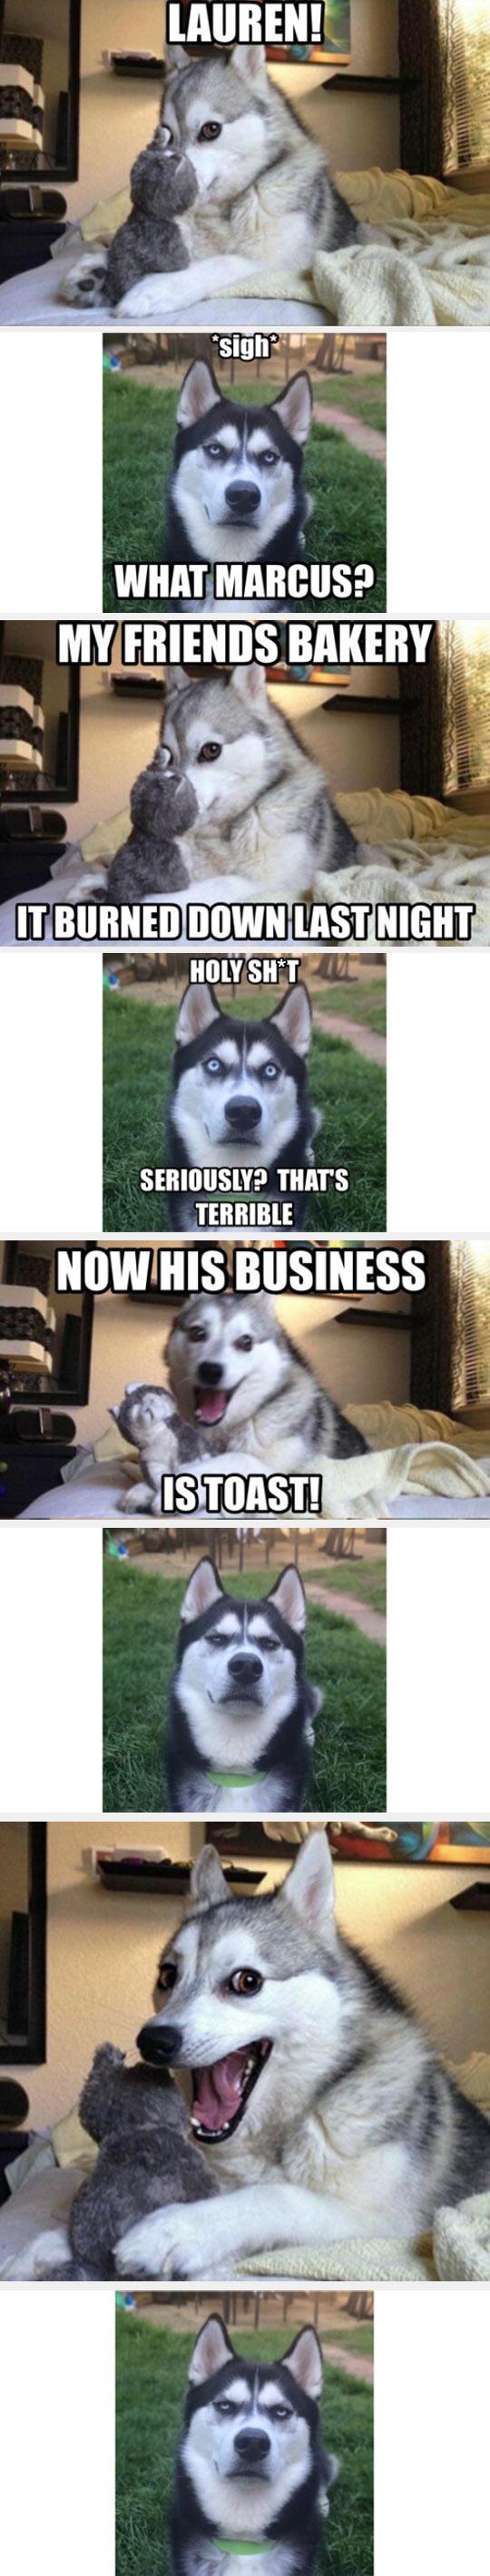 funny-pun-Husky-burn-toast